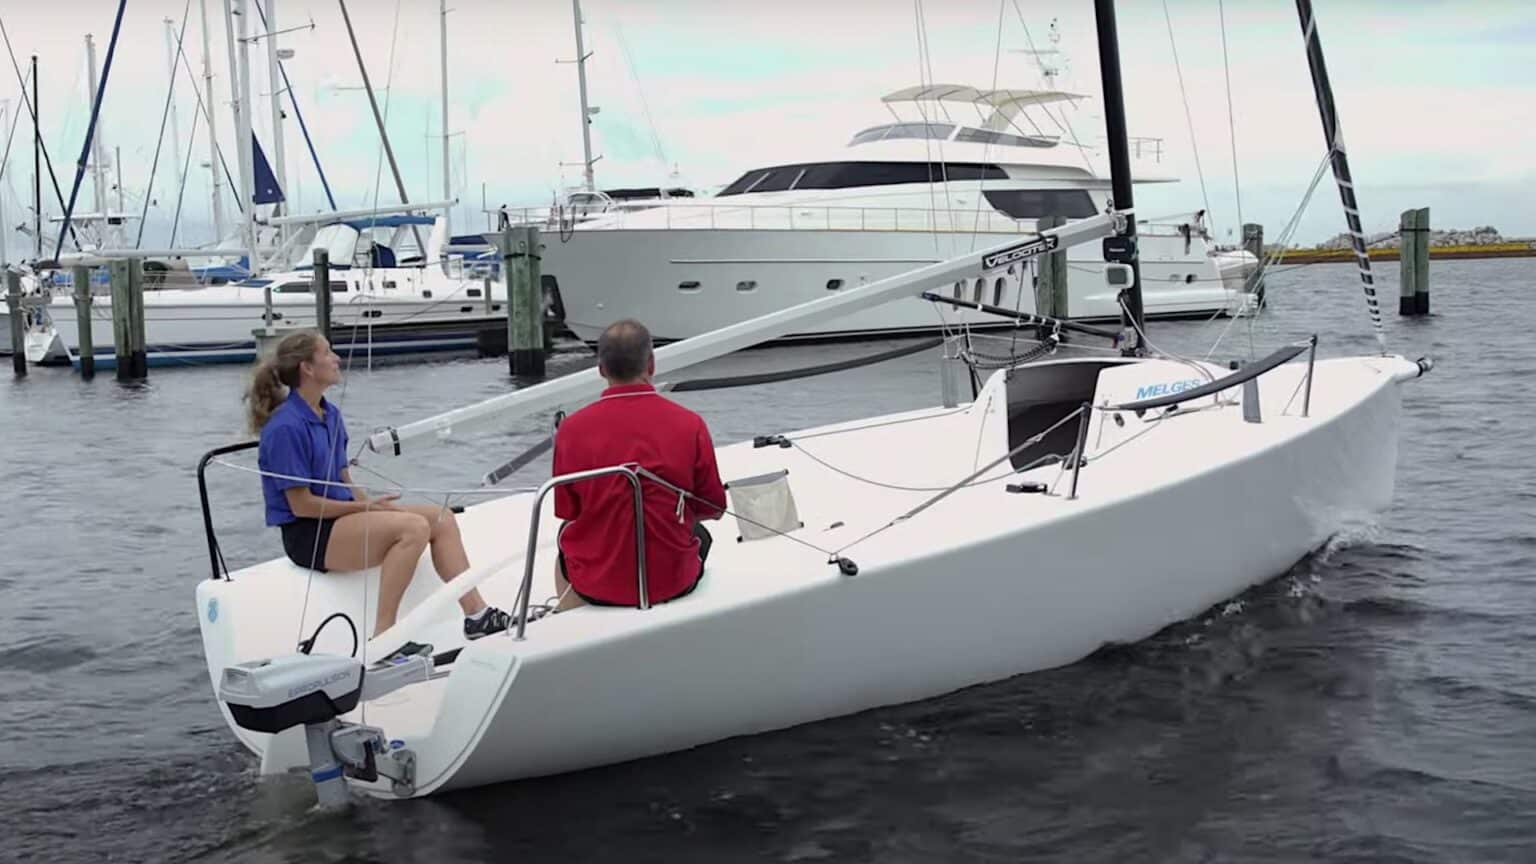 epropulsion electric outboard regeneration